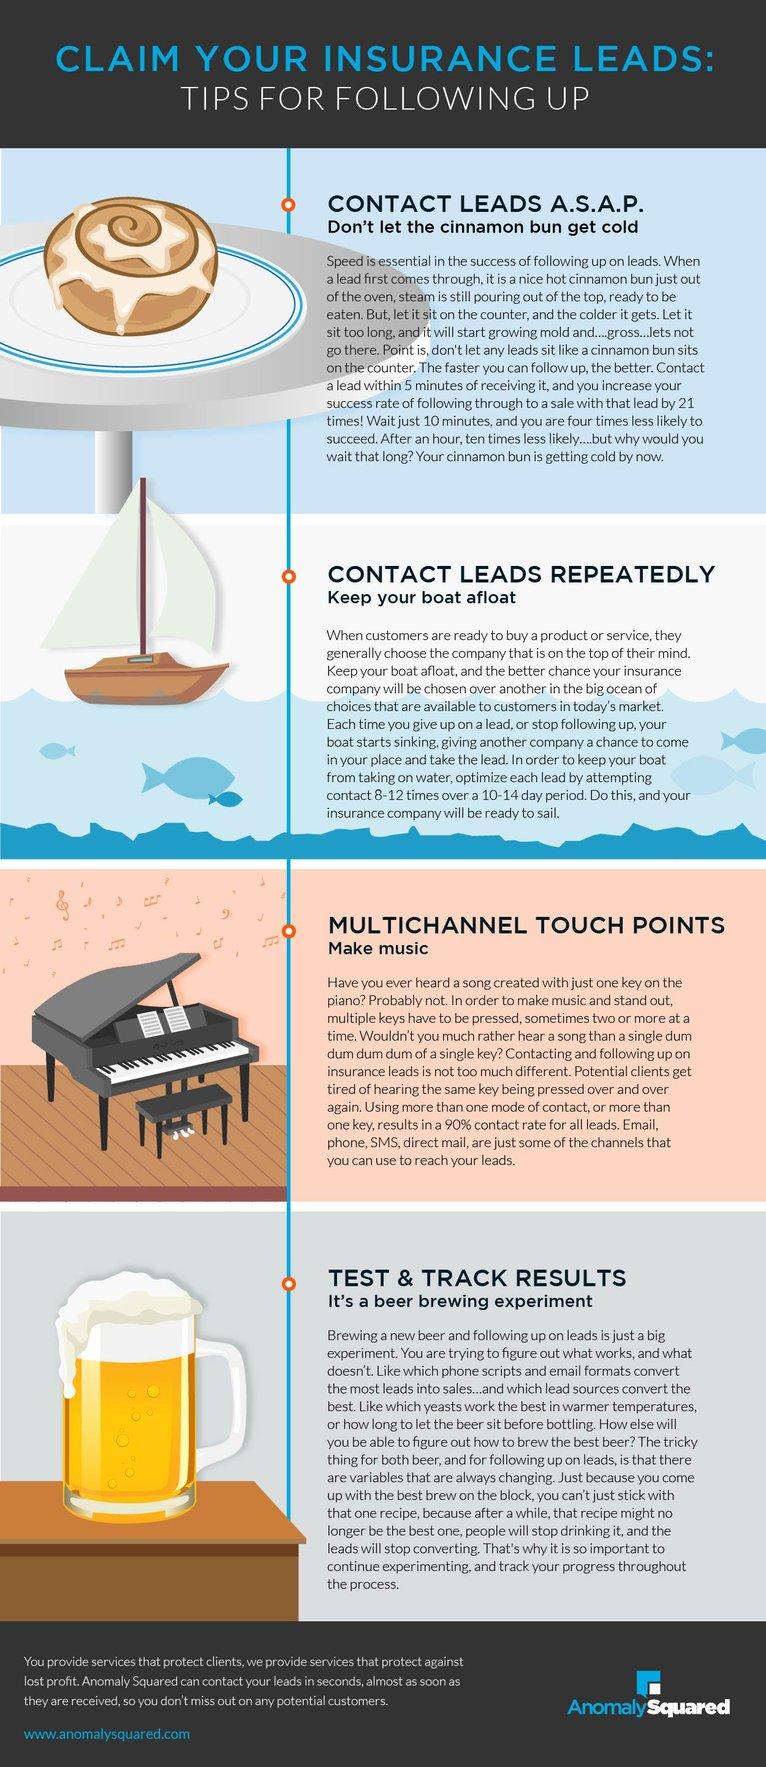 FollowingUpInsuranceLeads_Infographic-01-1.jpg